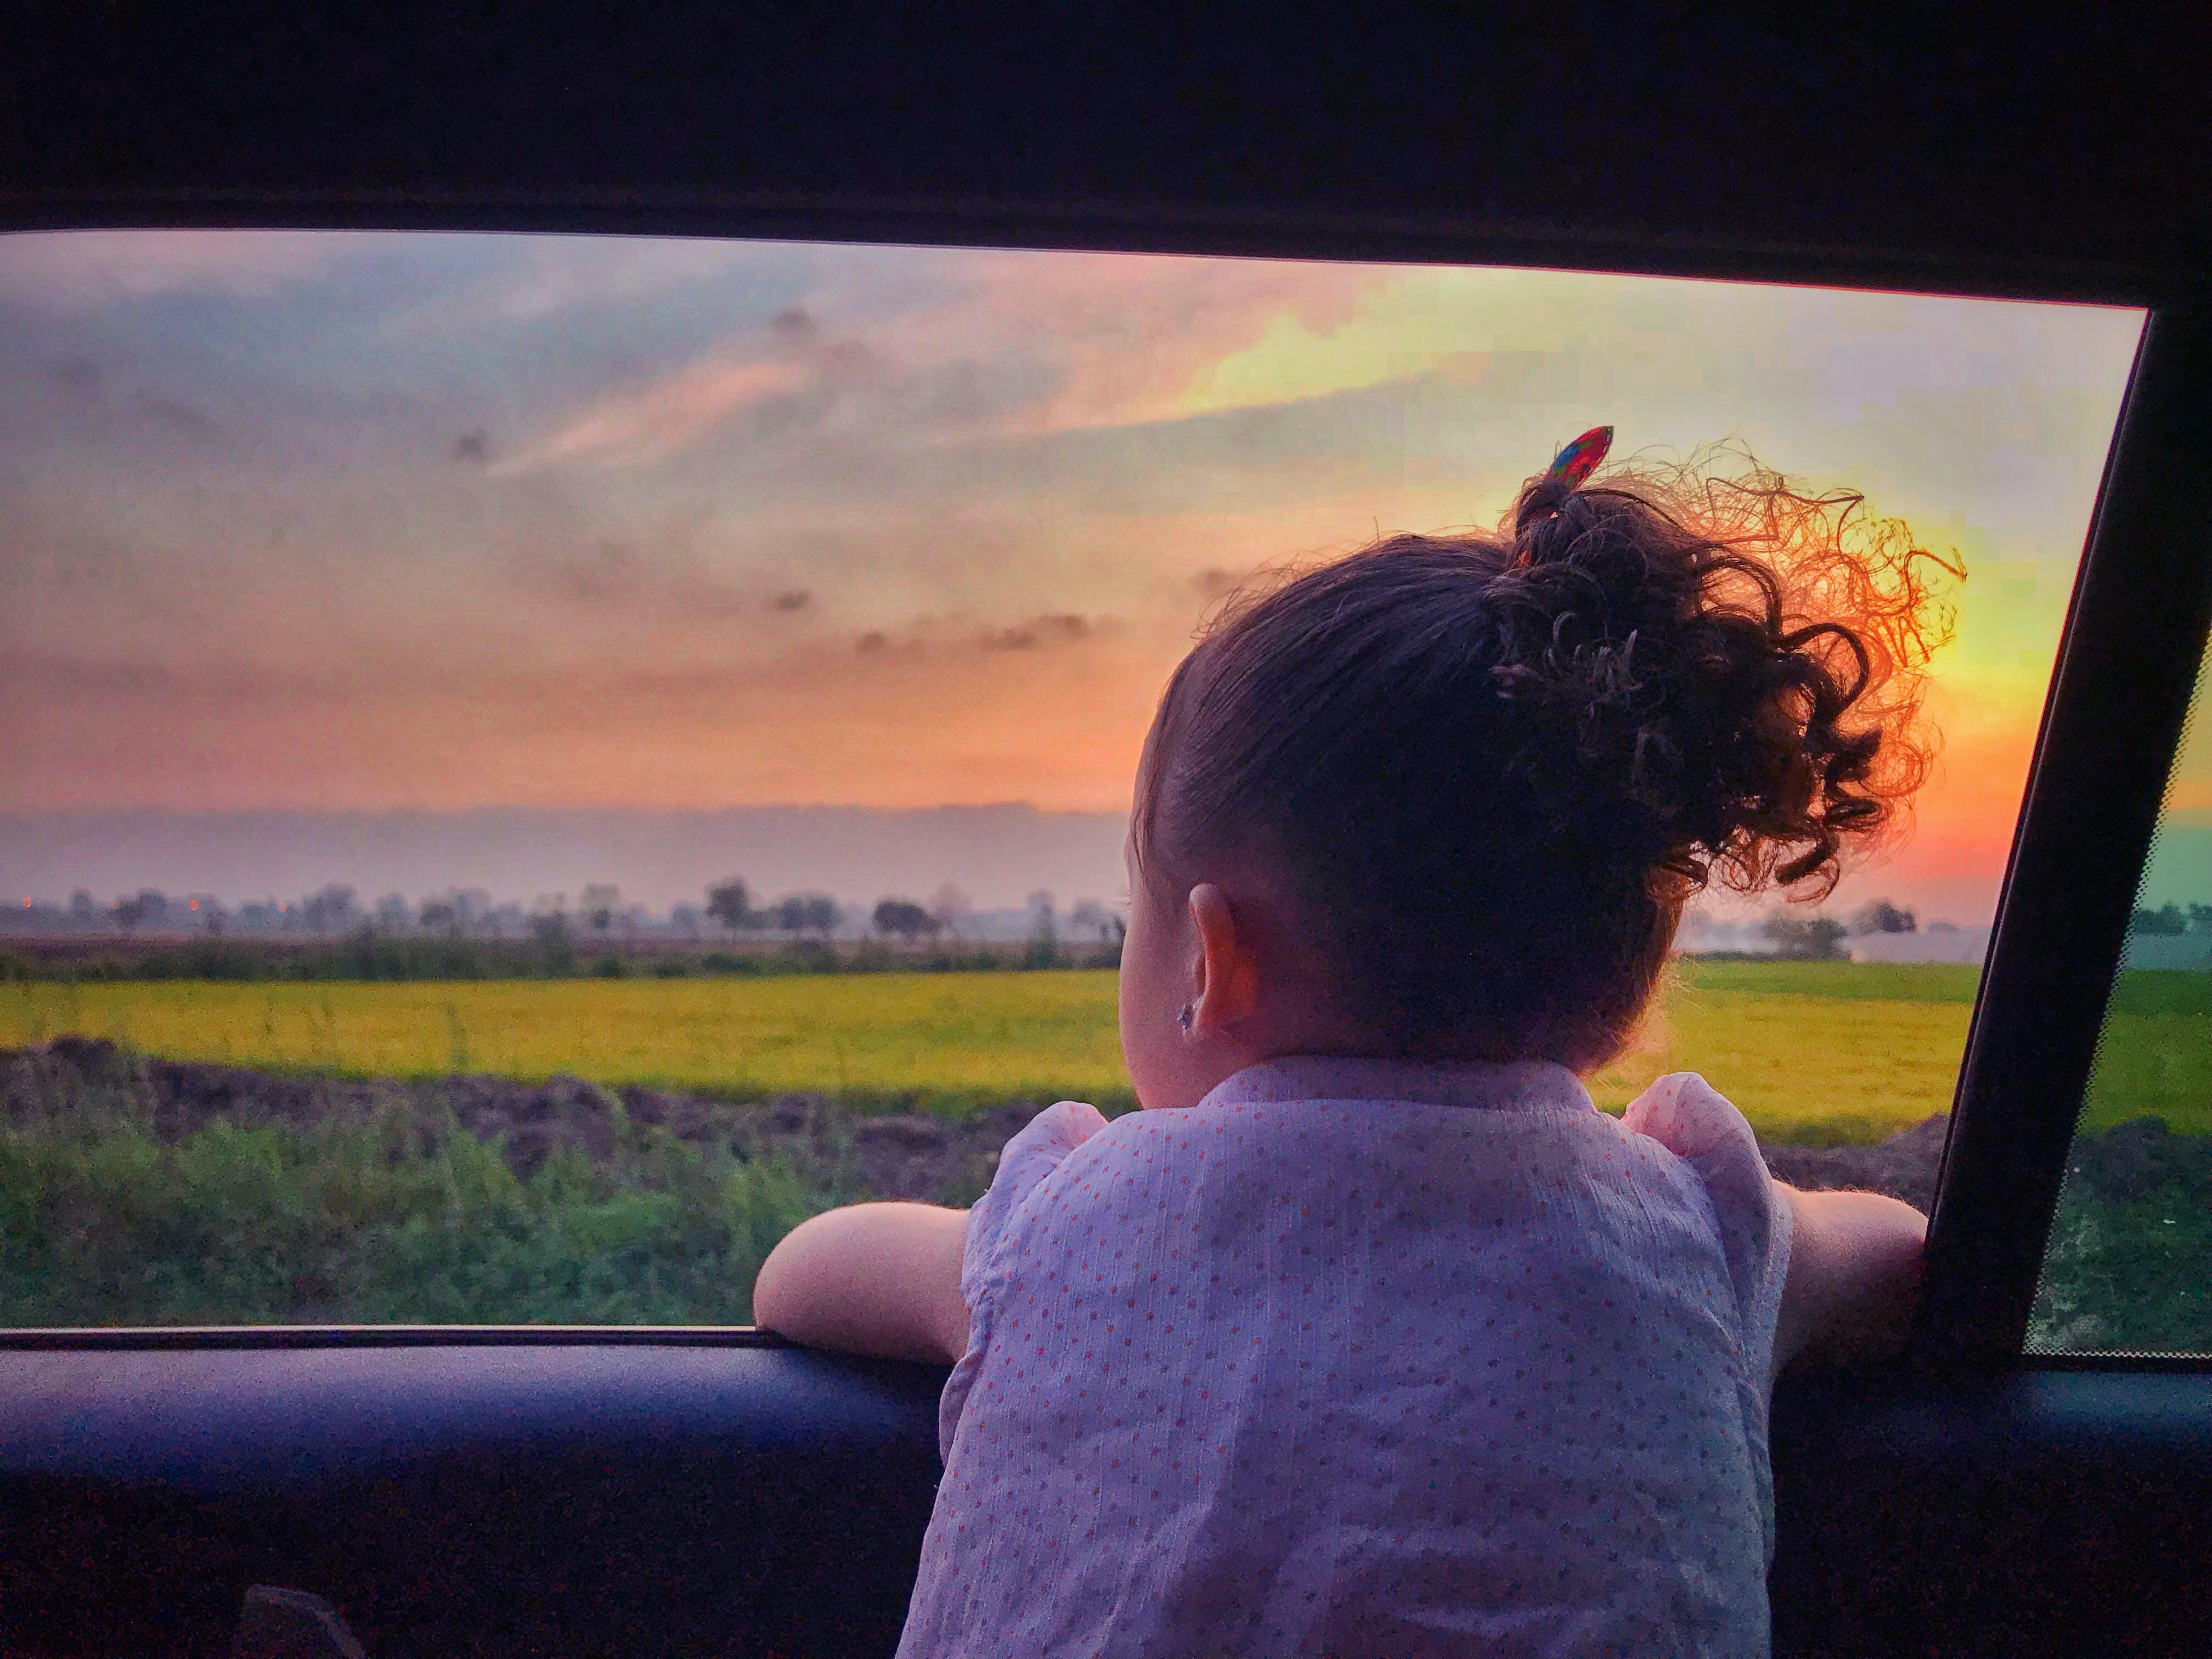 Free stock photo of baby girl, girl, golden sunset, nature